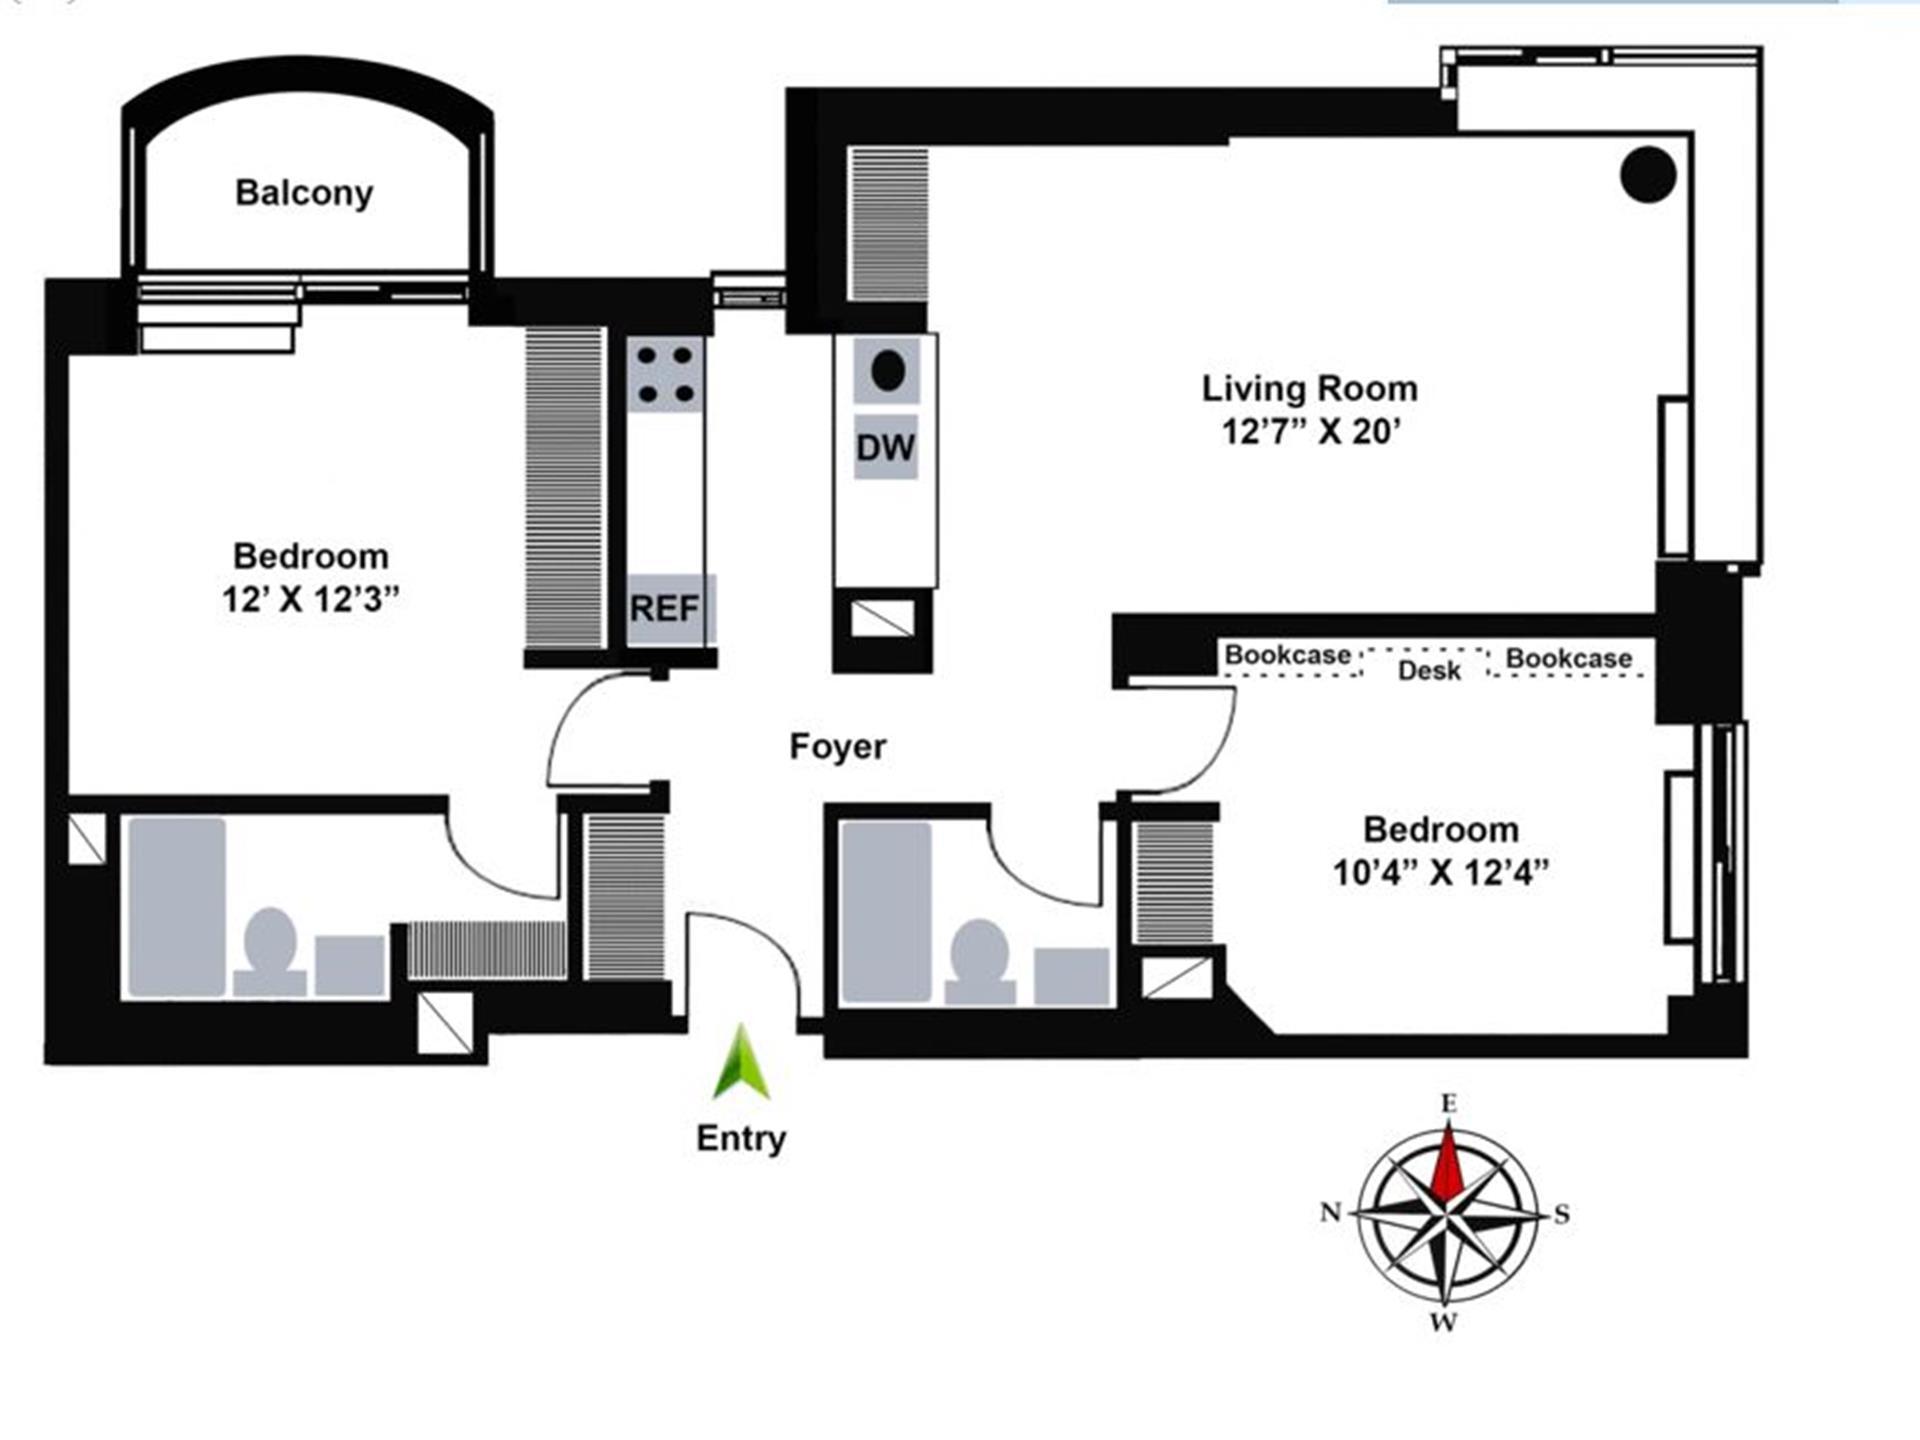 Floor plan of 157 East 32nd St, 22B - Murray Hill, New York